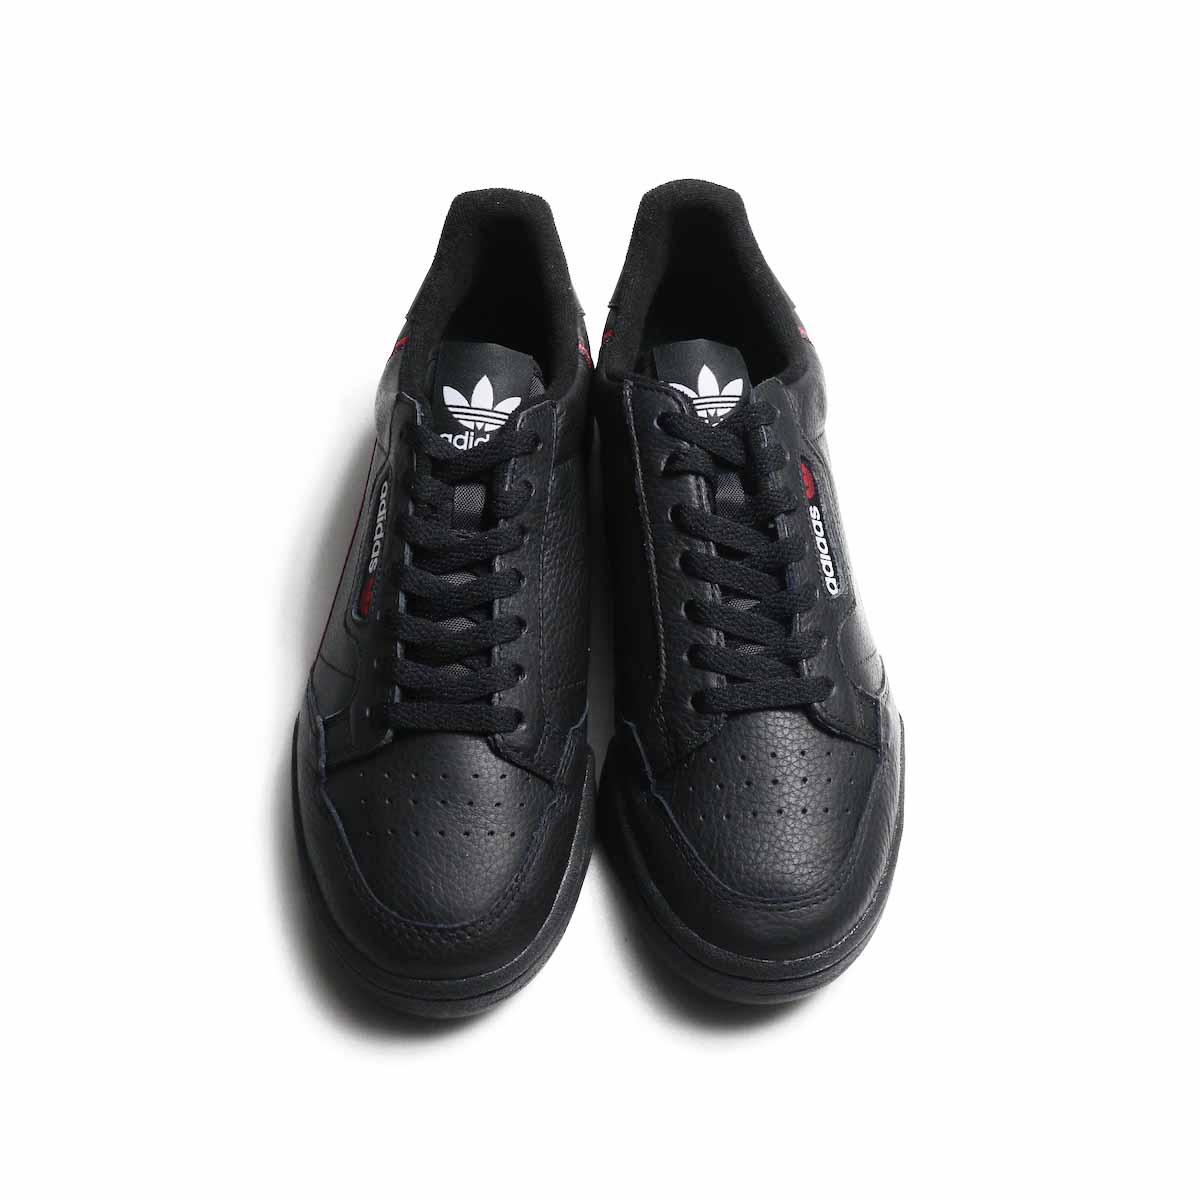 adidas originals / CONTINENTAL80 (G27707) -Black 正面